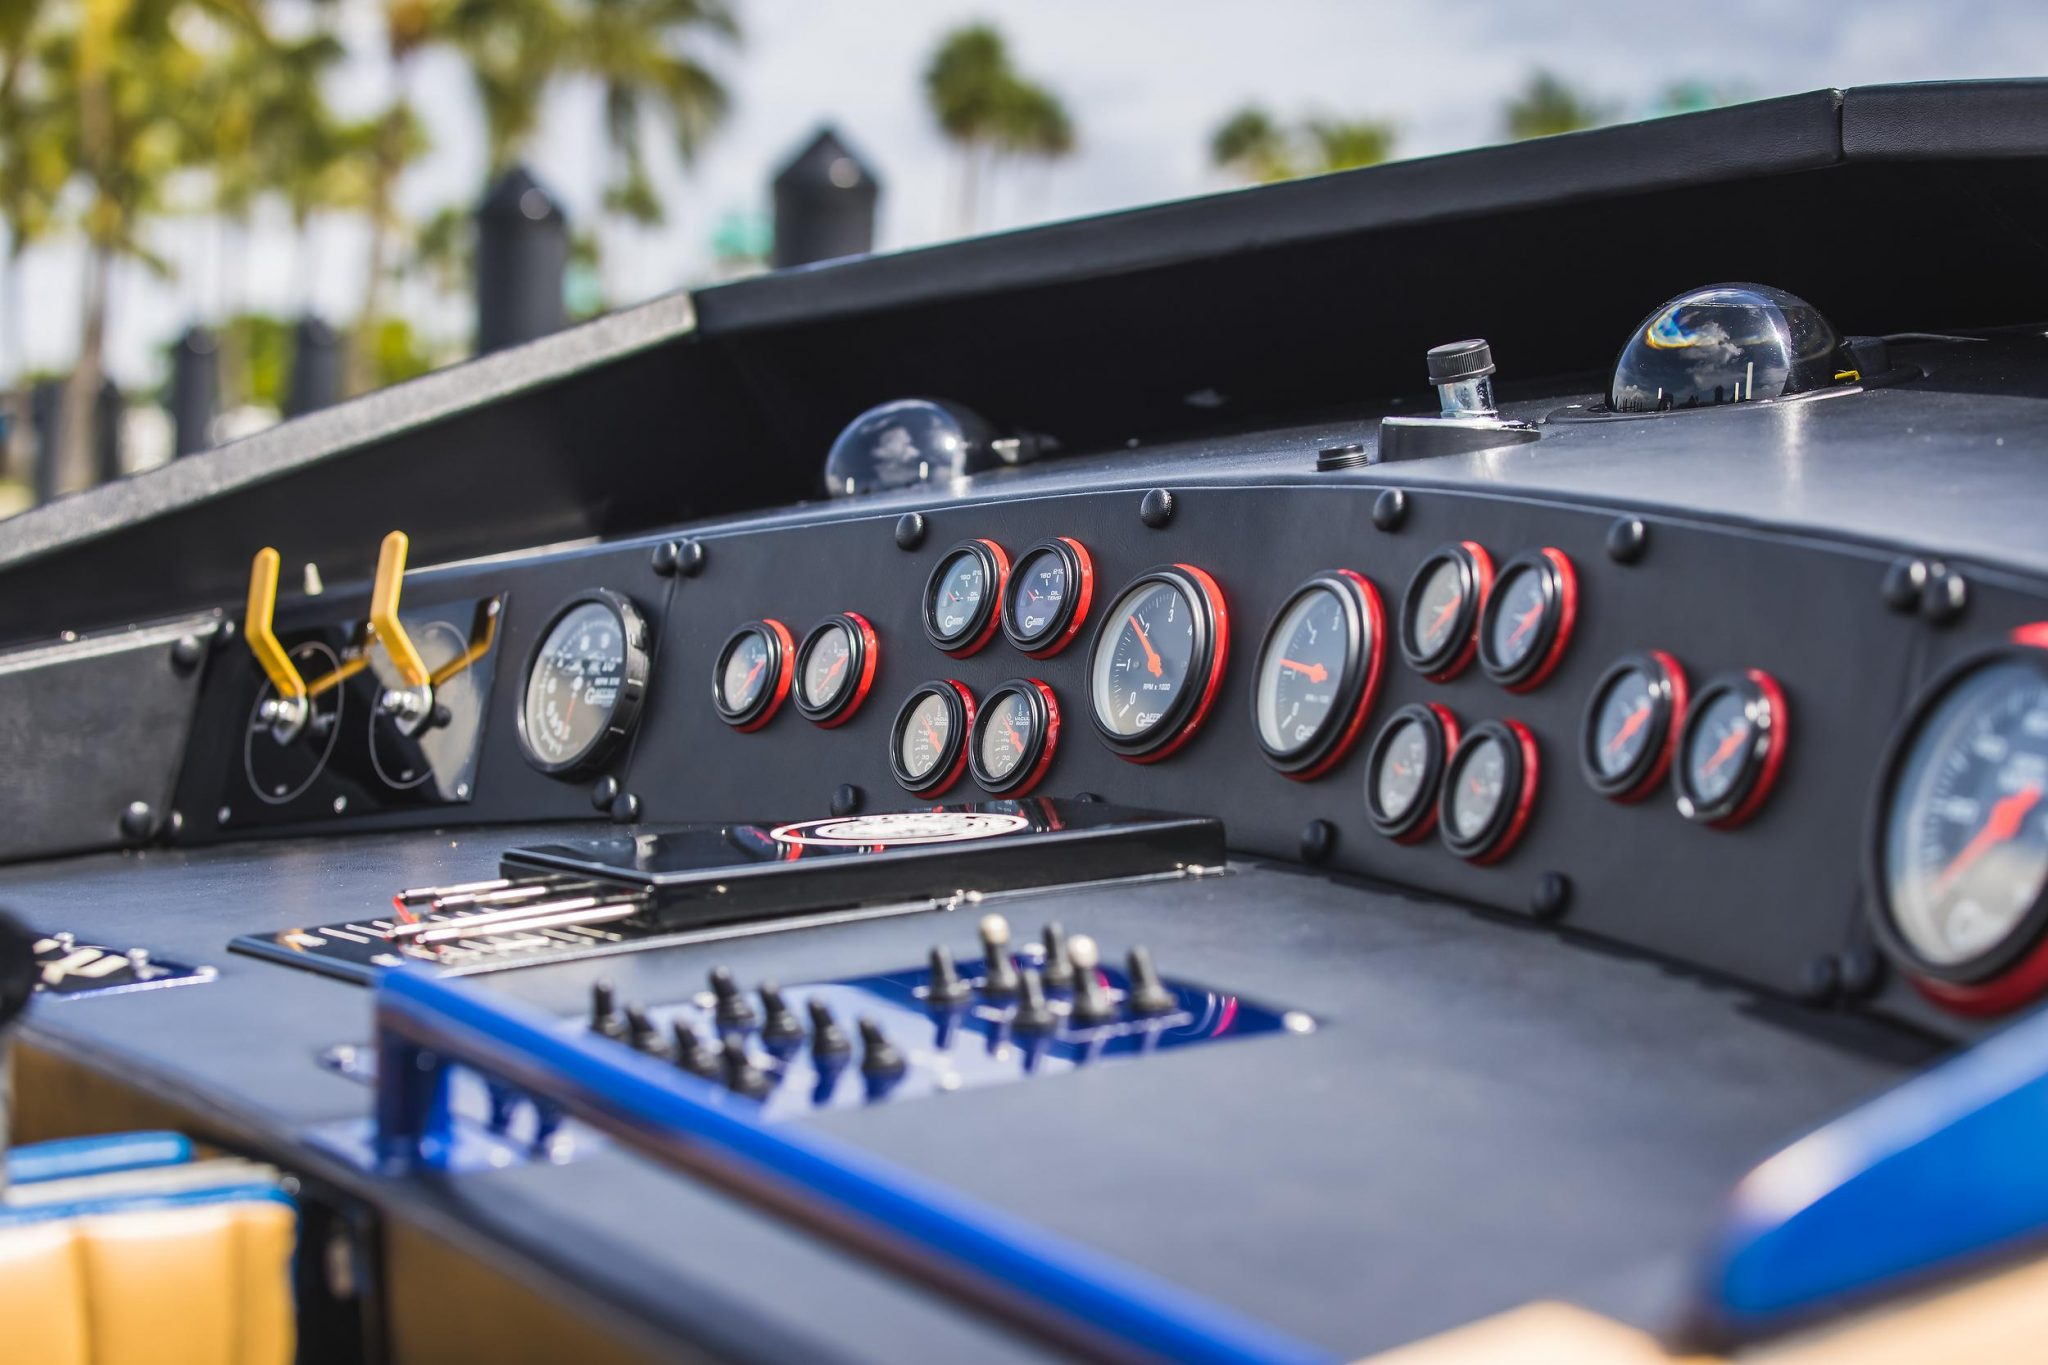 1984 Apache Offshore Powerboat Warpath console gauges